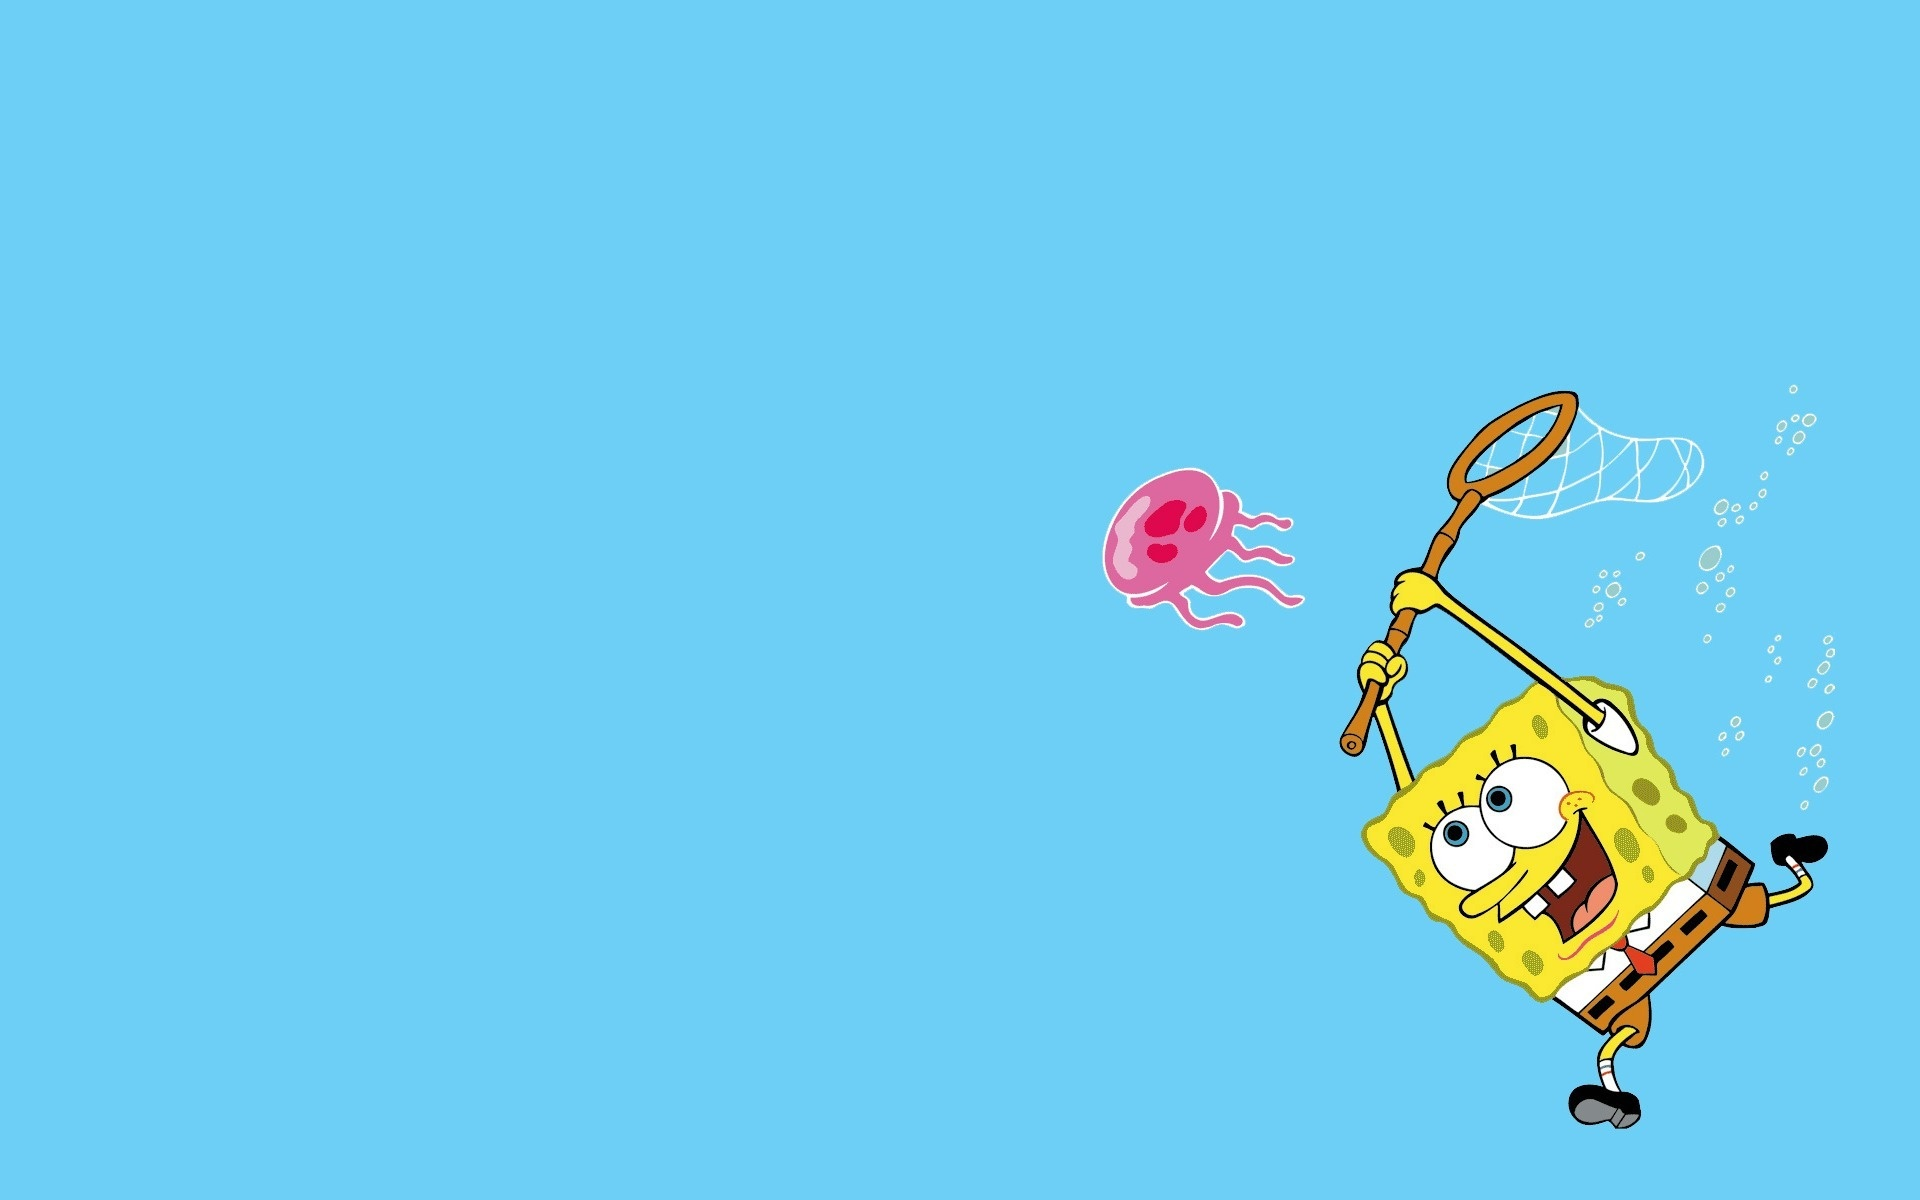 Spongebob Squarepants Pictures HD Desktop Wallpaper HD Desktop 1920x1200